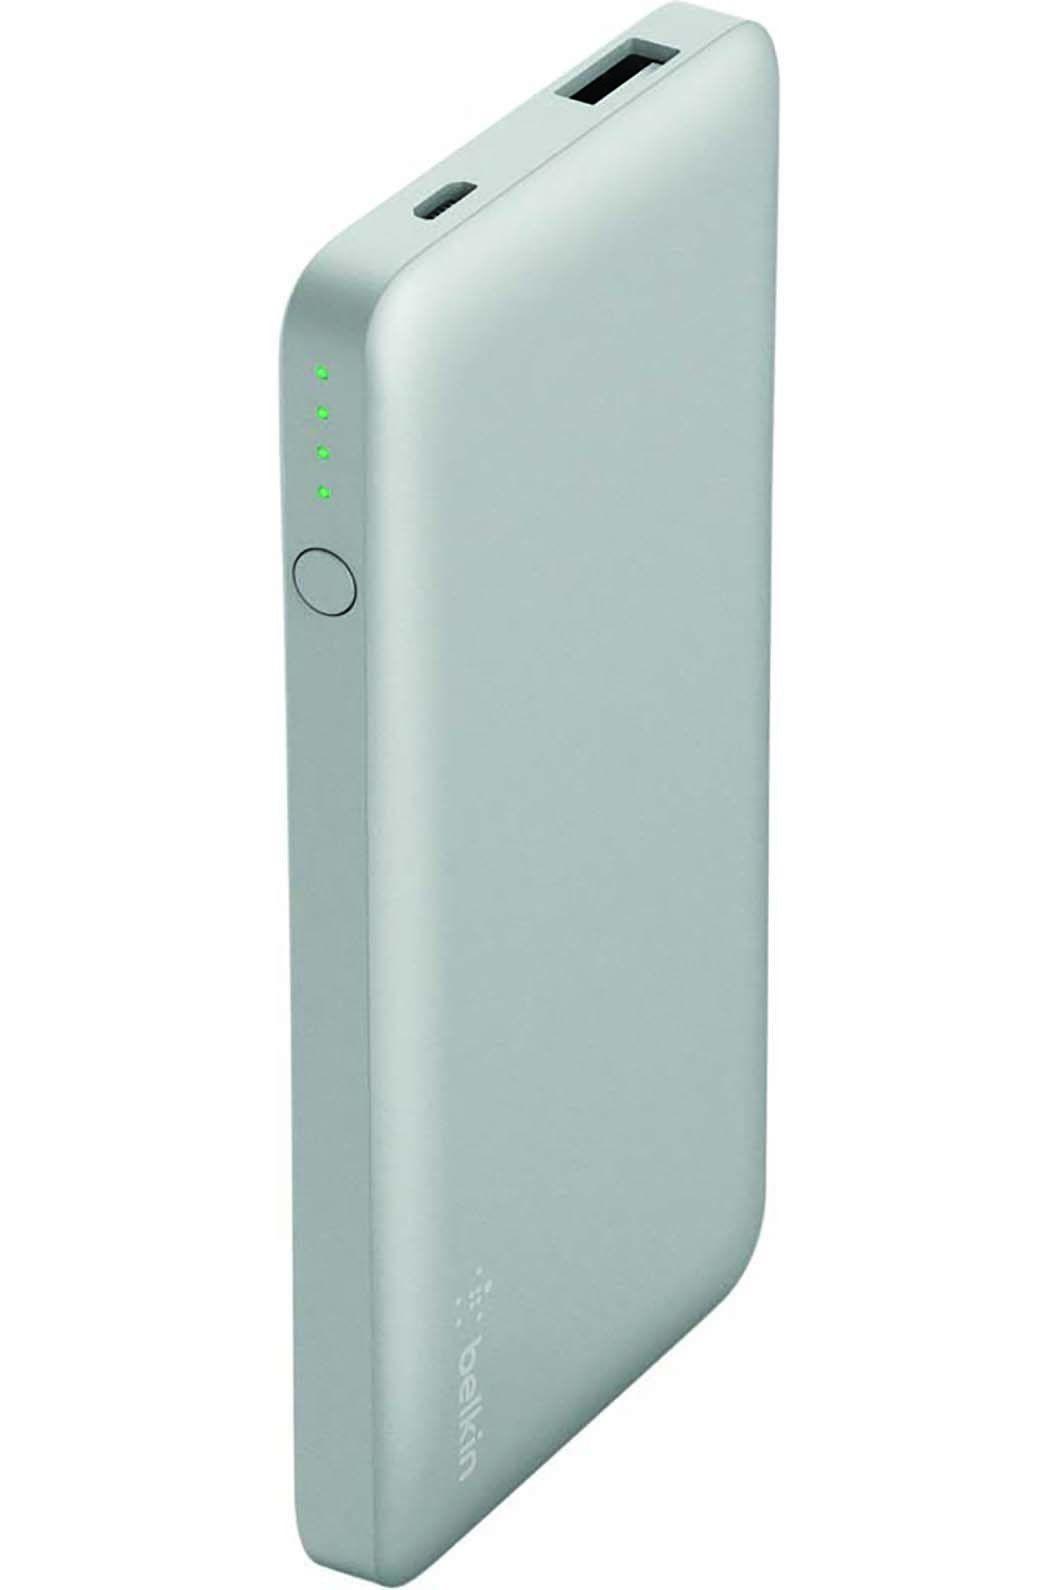 Belkin Pocket Power 5K Power Bank, Silver, hi-res